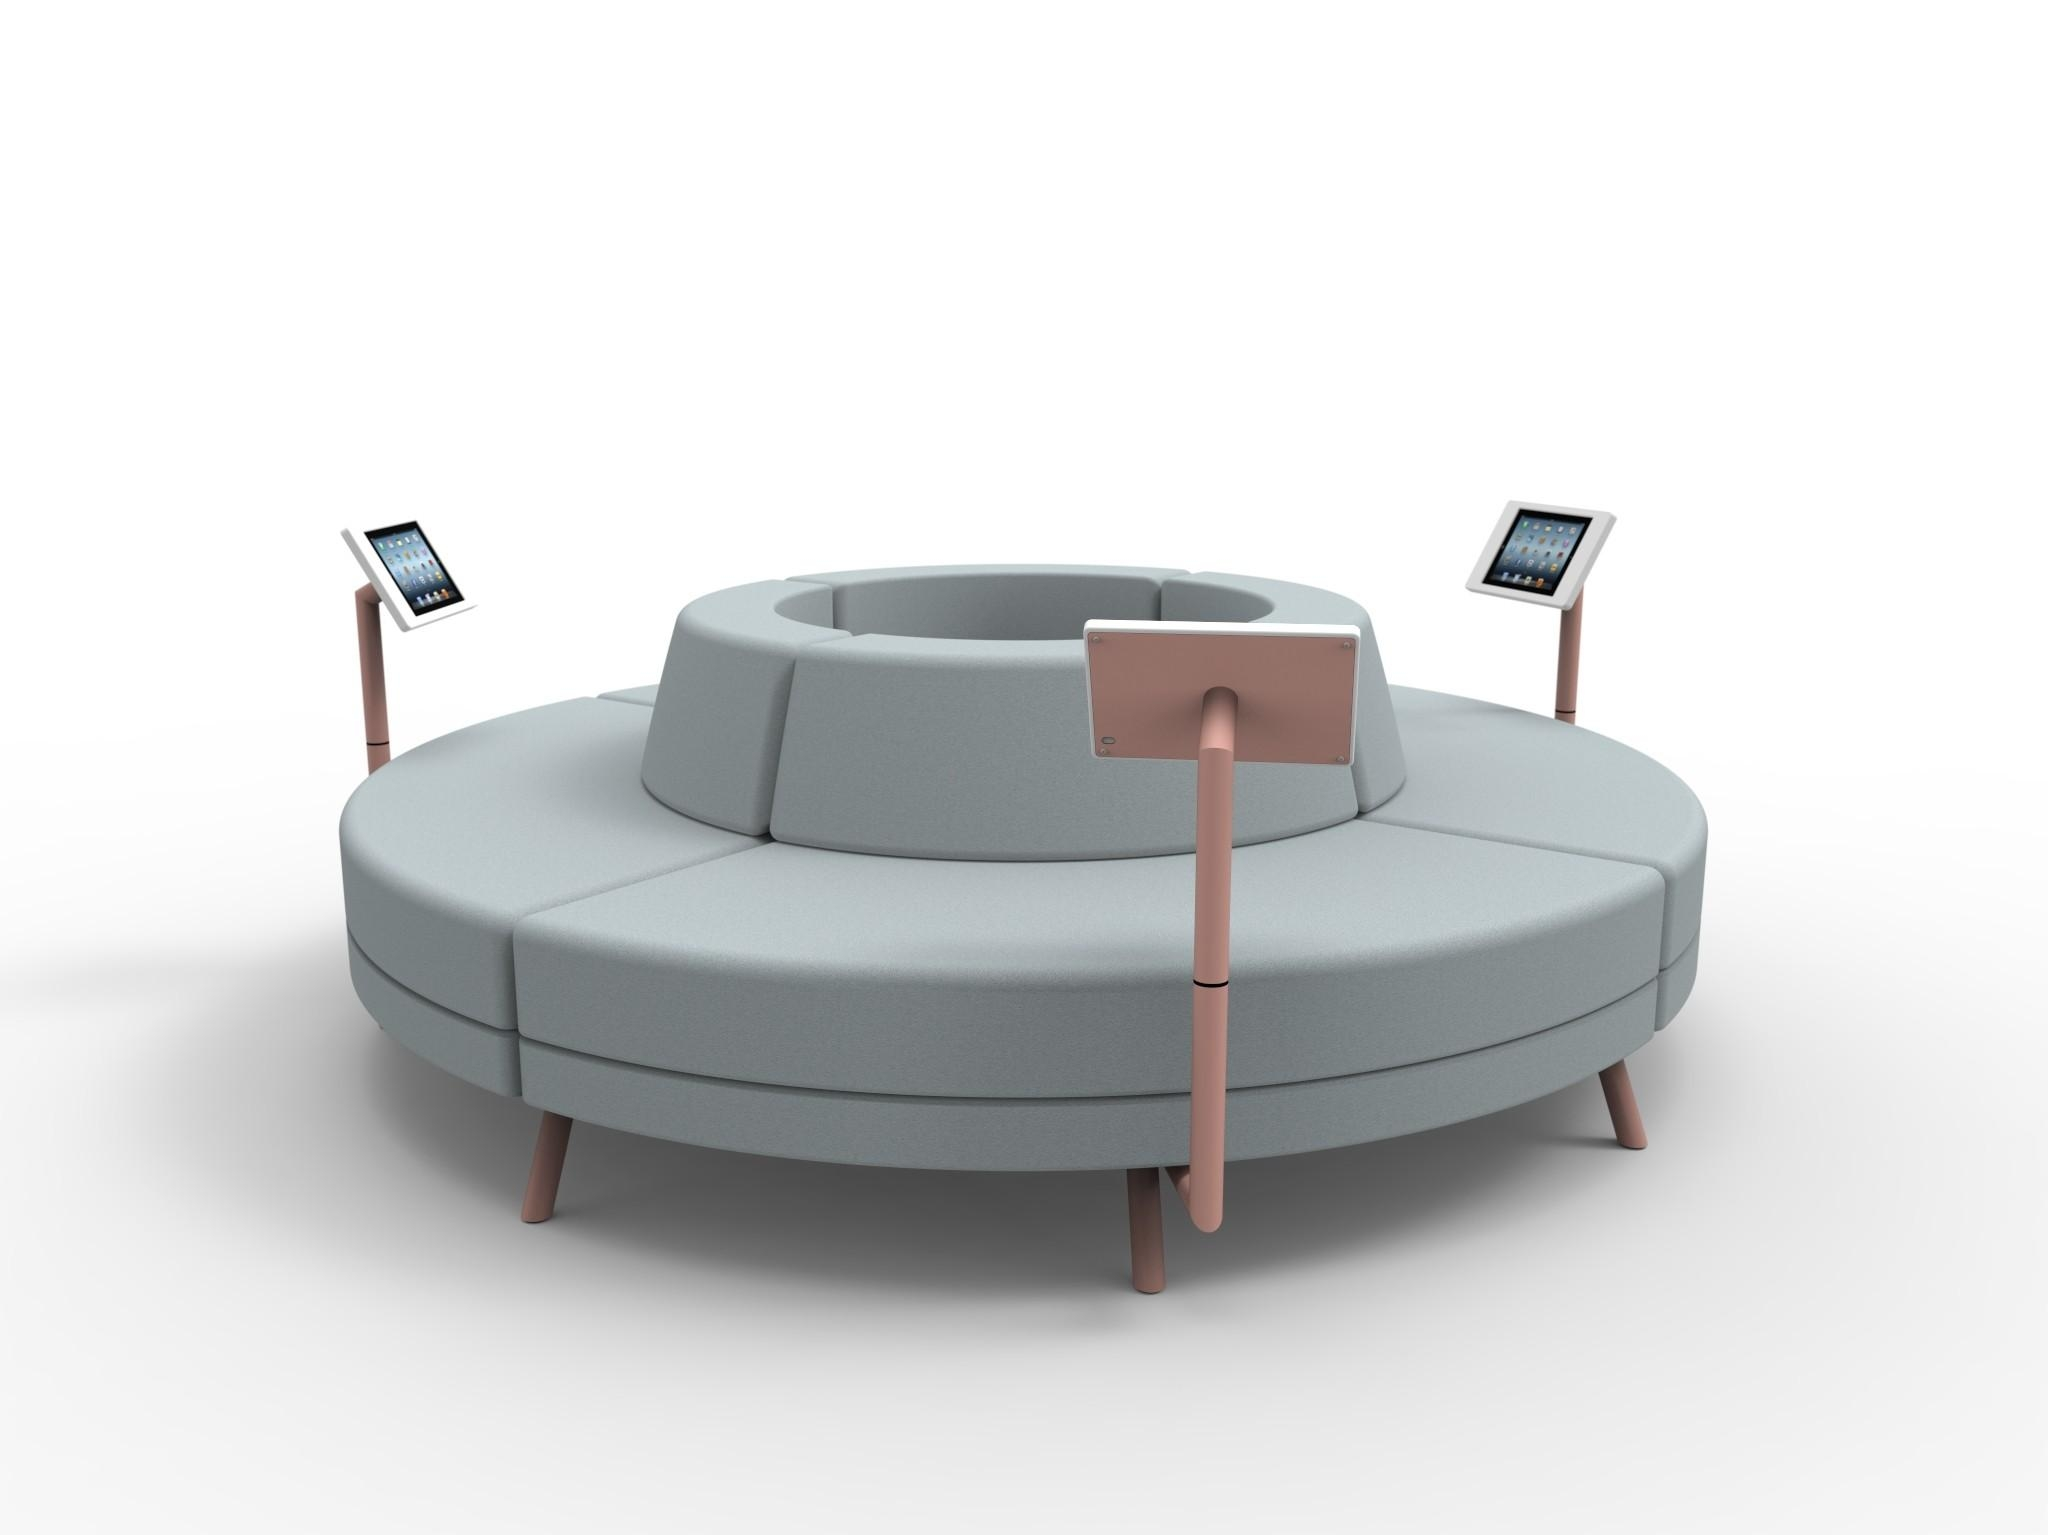 Round Sofas Canada – Gallery Image Iransafebox Pertaining To Round Sofas (View 18 of 20)